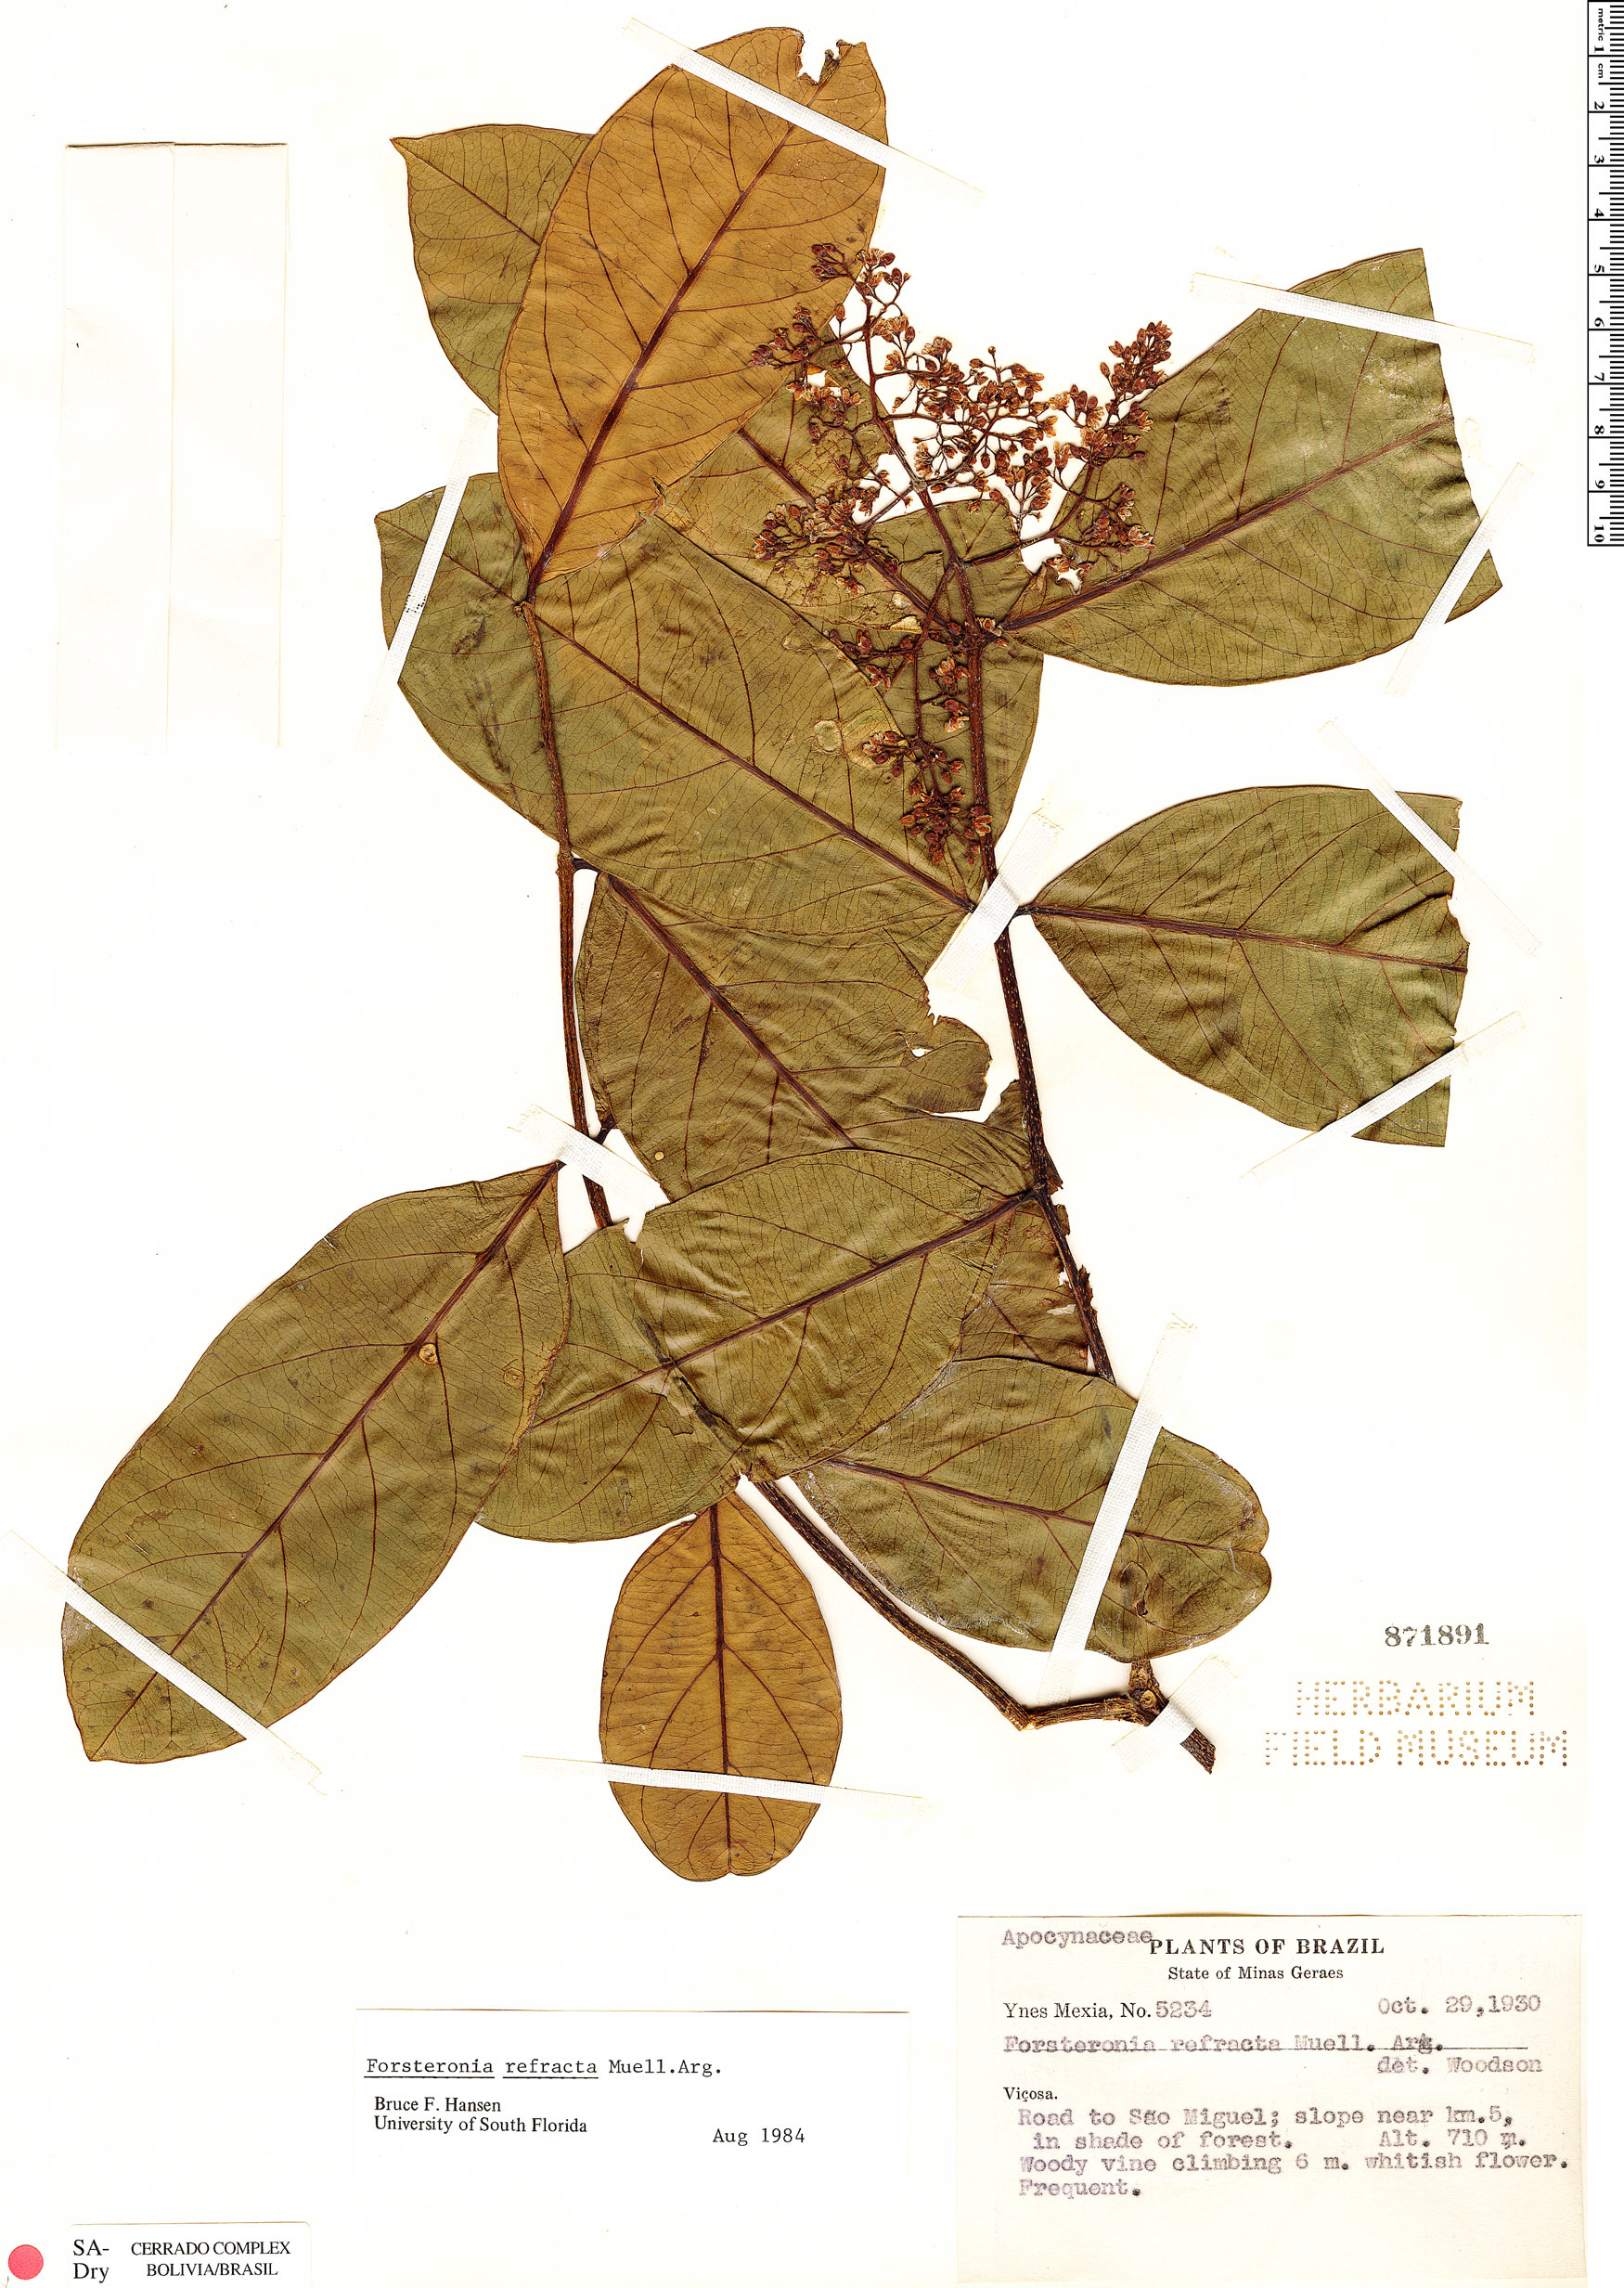 Specimen: Forsteronia refracta